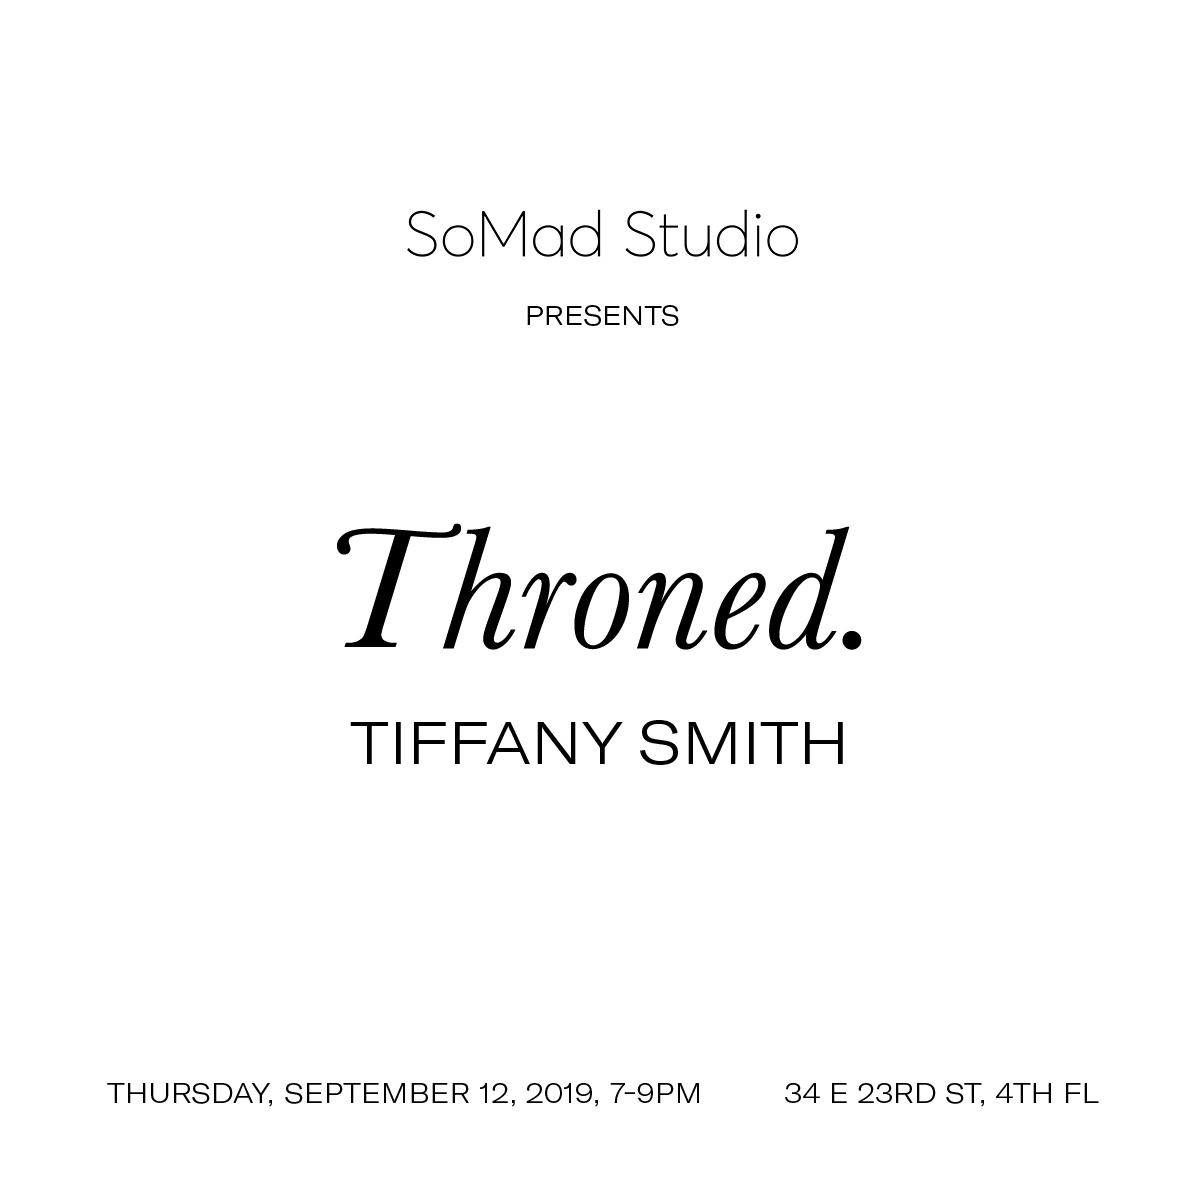 Throned_TiffanySmith_Social.jpg